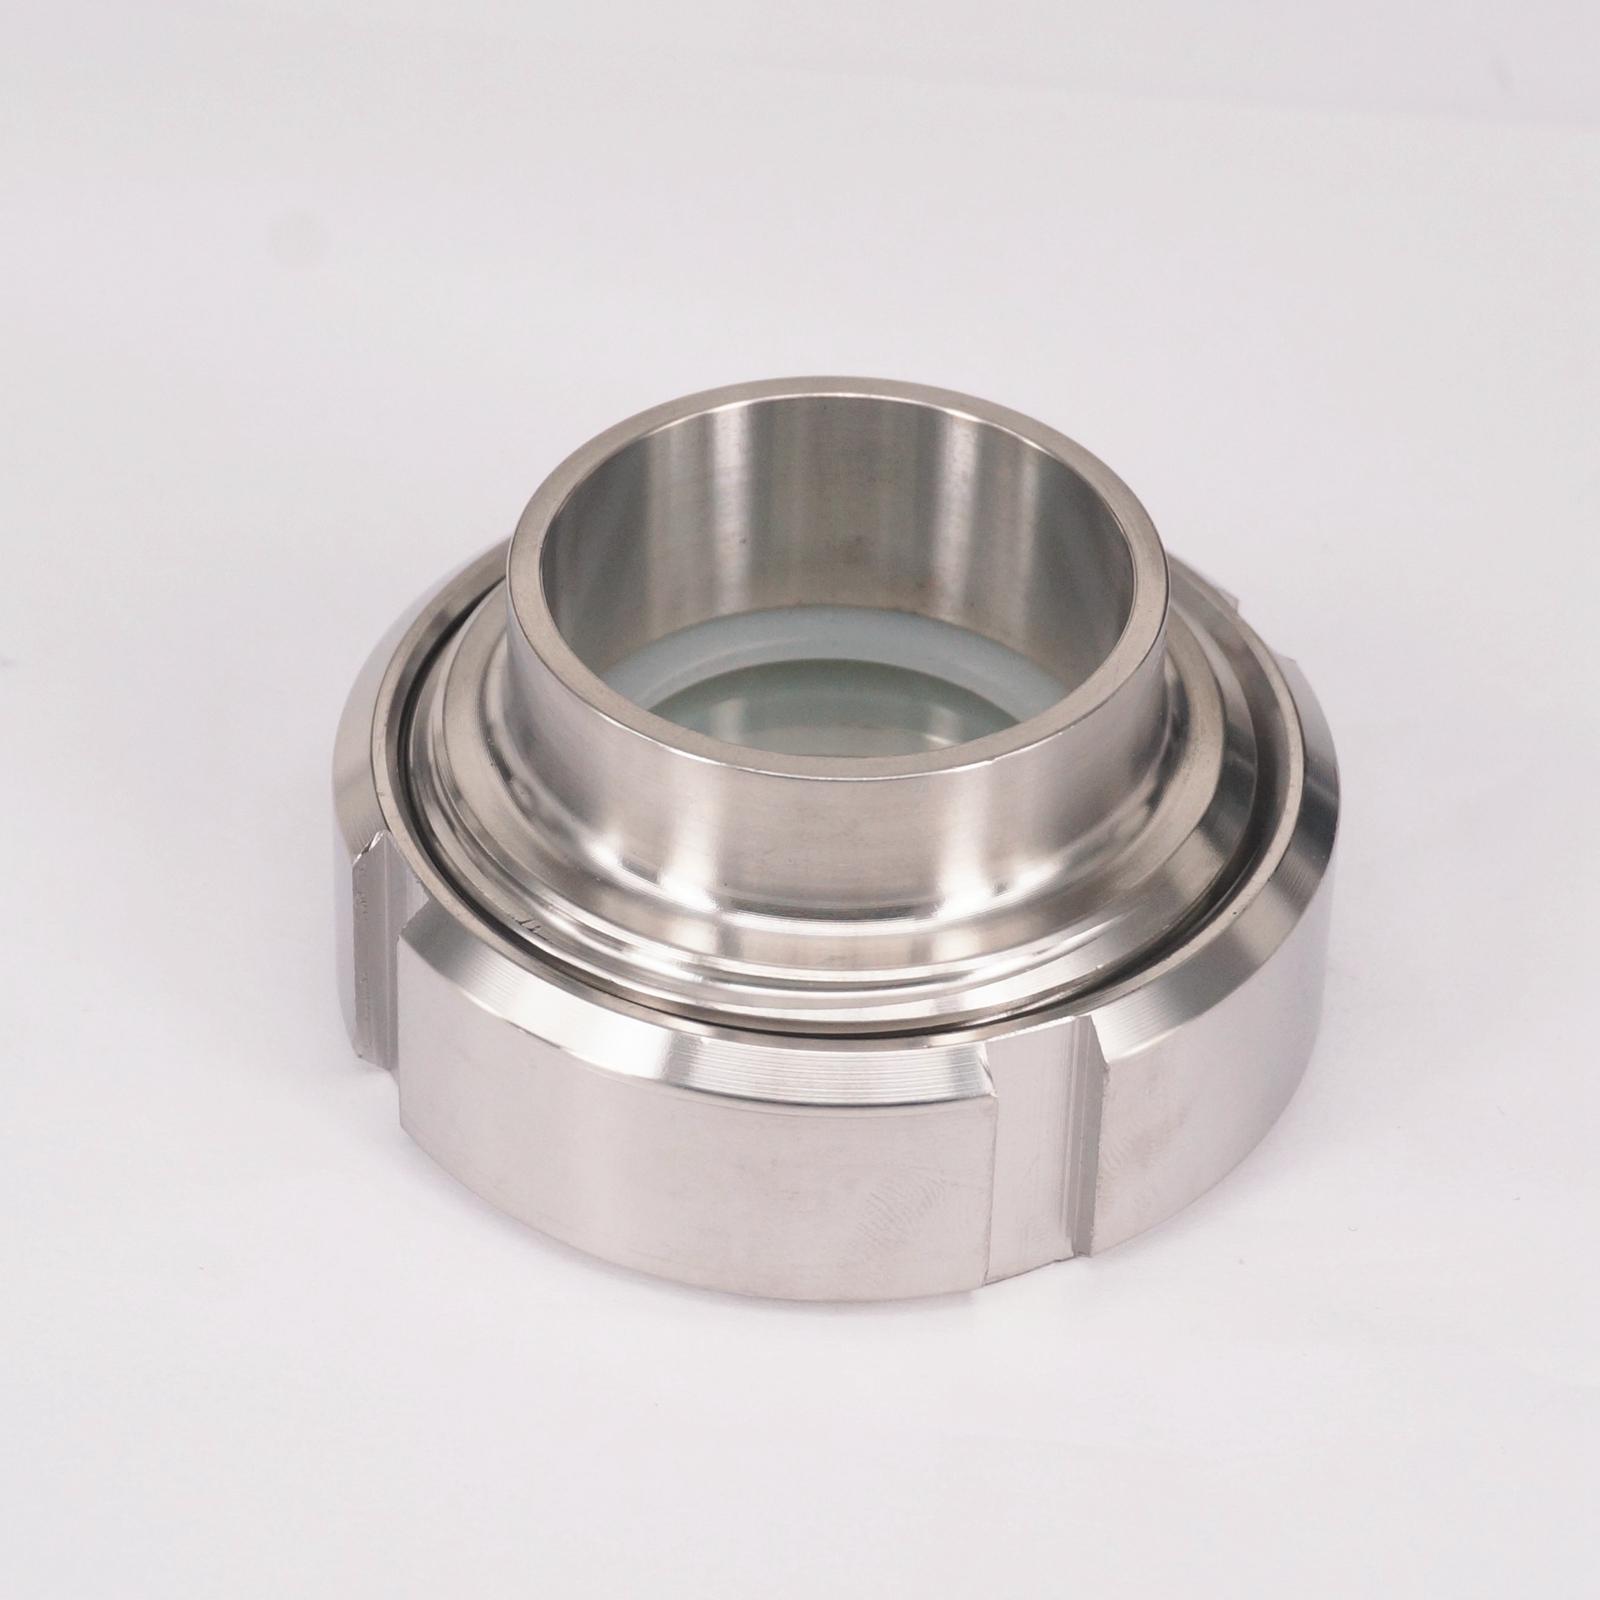 Rohre & Armaturen Aktiv 45mm Rohr Od 304 Edelstahl Sanitär Weld Union Schauglas Homebrew 229 Psi Hygiene Grade Sanitär Sanitär